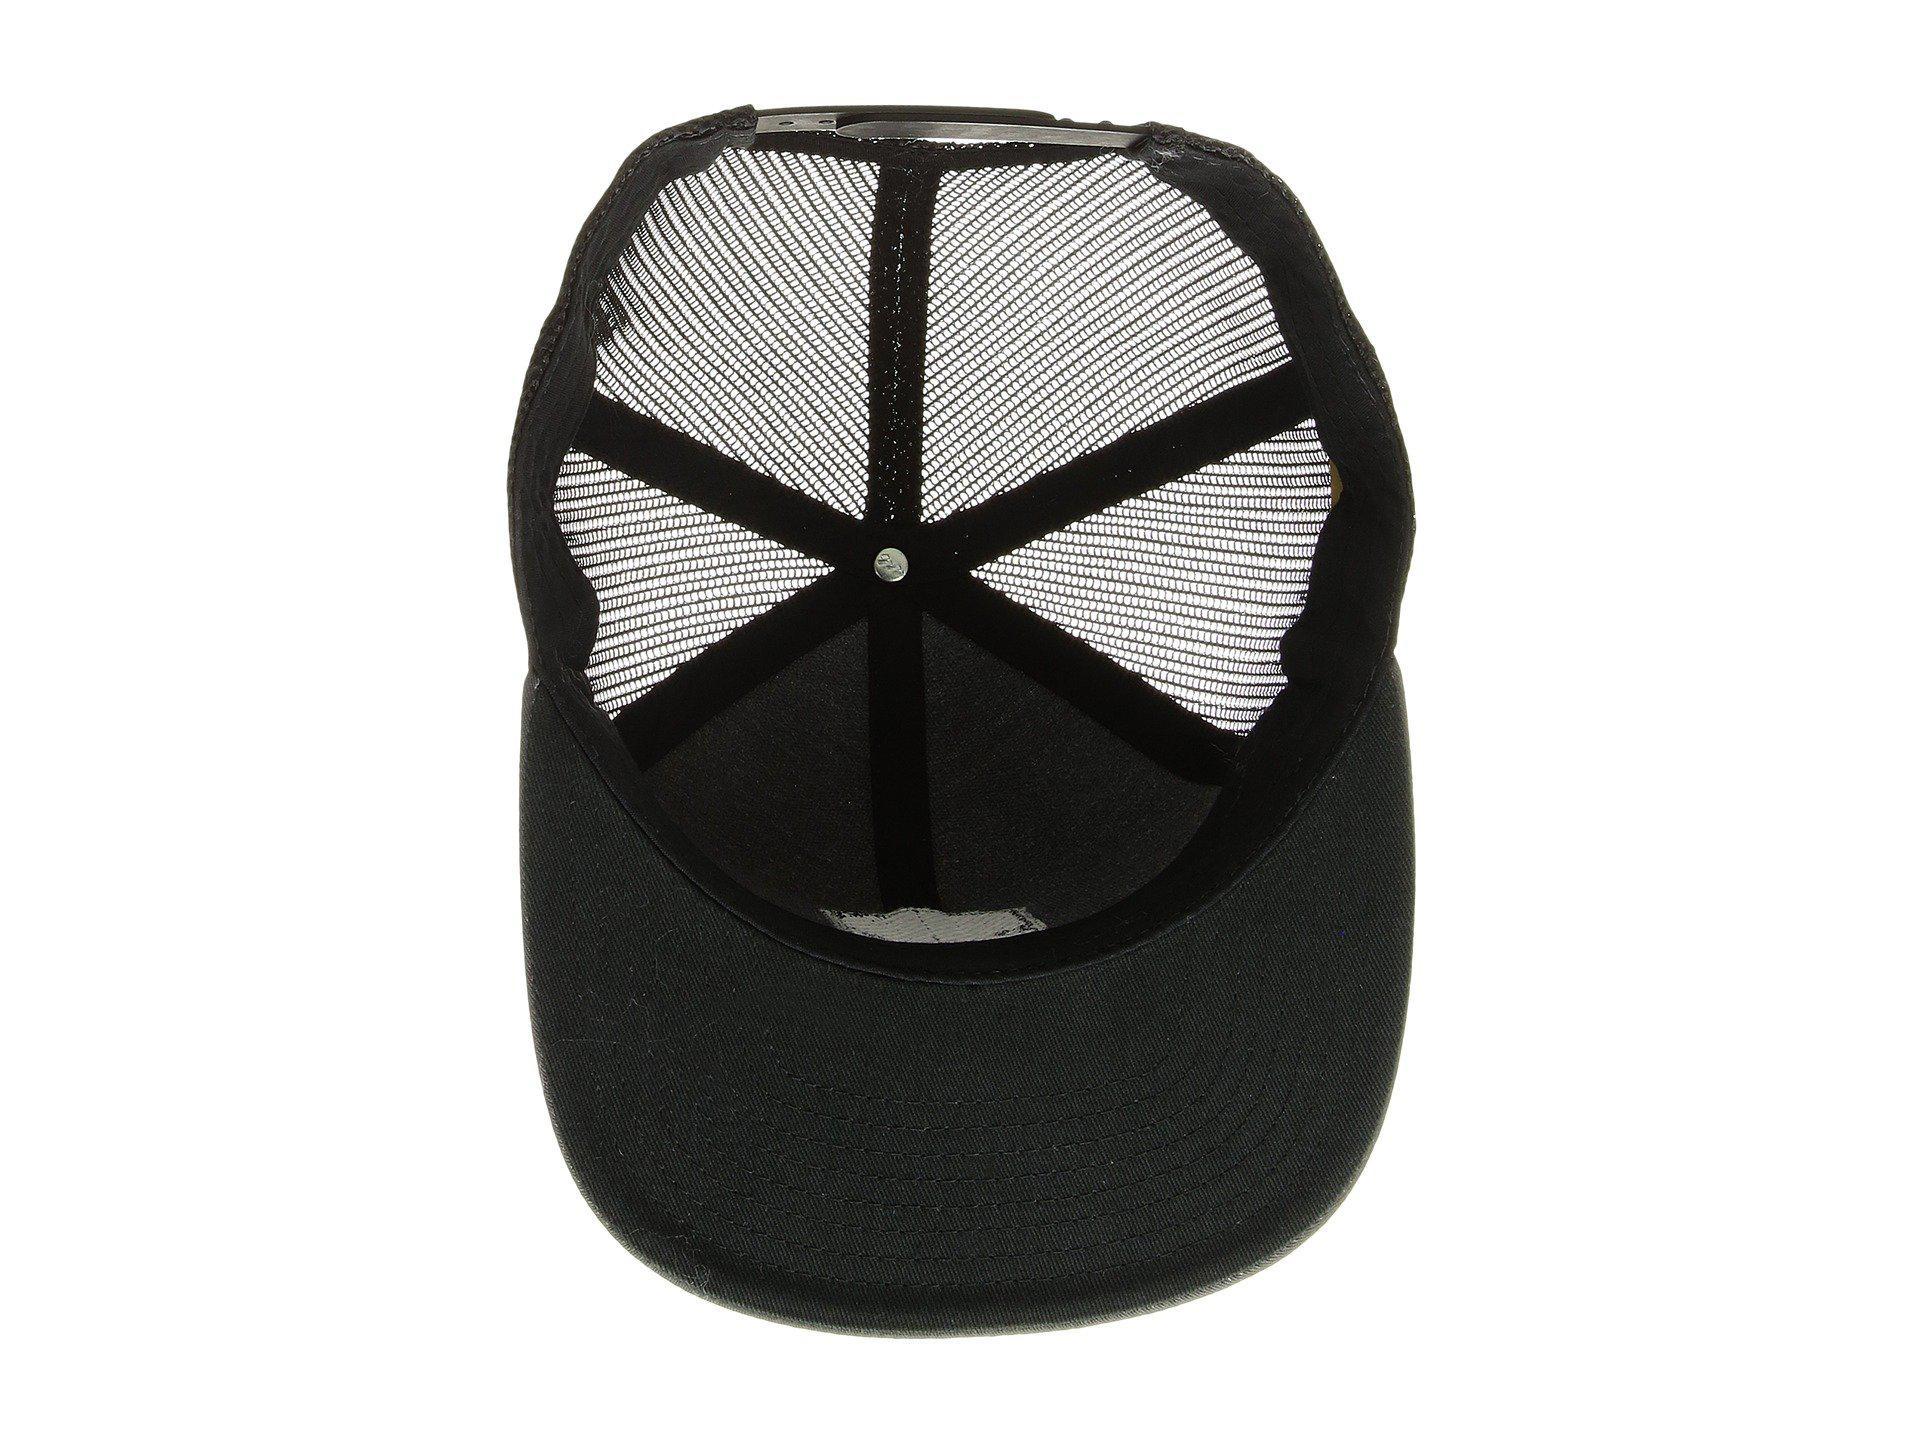 66040c453bcc2 Spyder Clutch Cap in Black for Men - Lyst